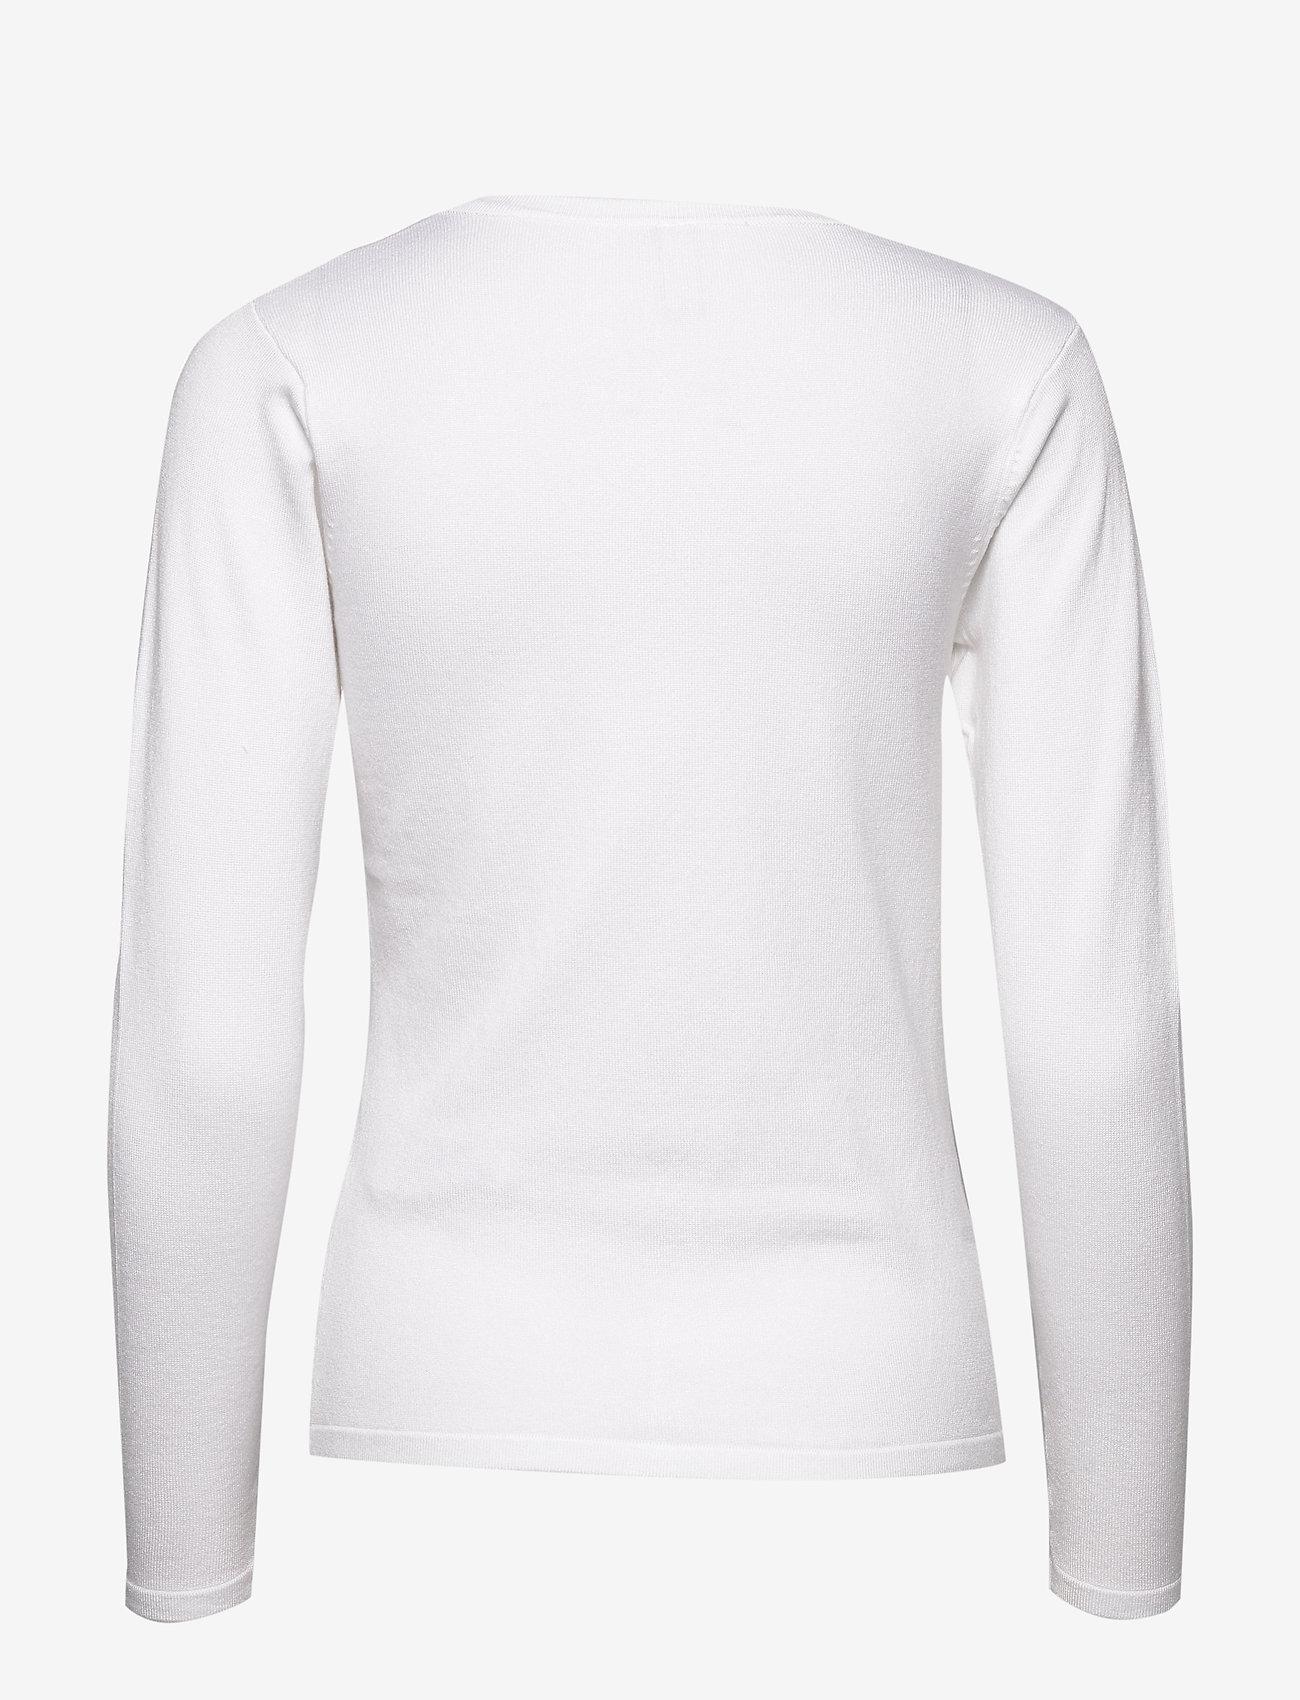 Sc-dollie (White) - Soyaconcept 9StH9l